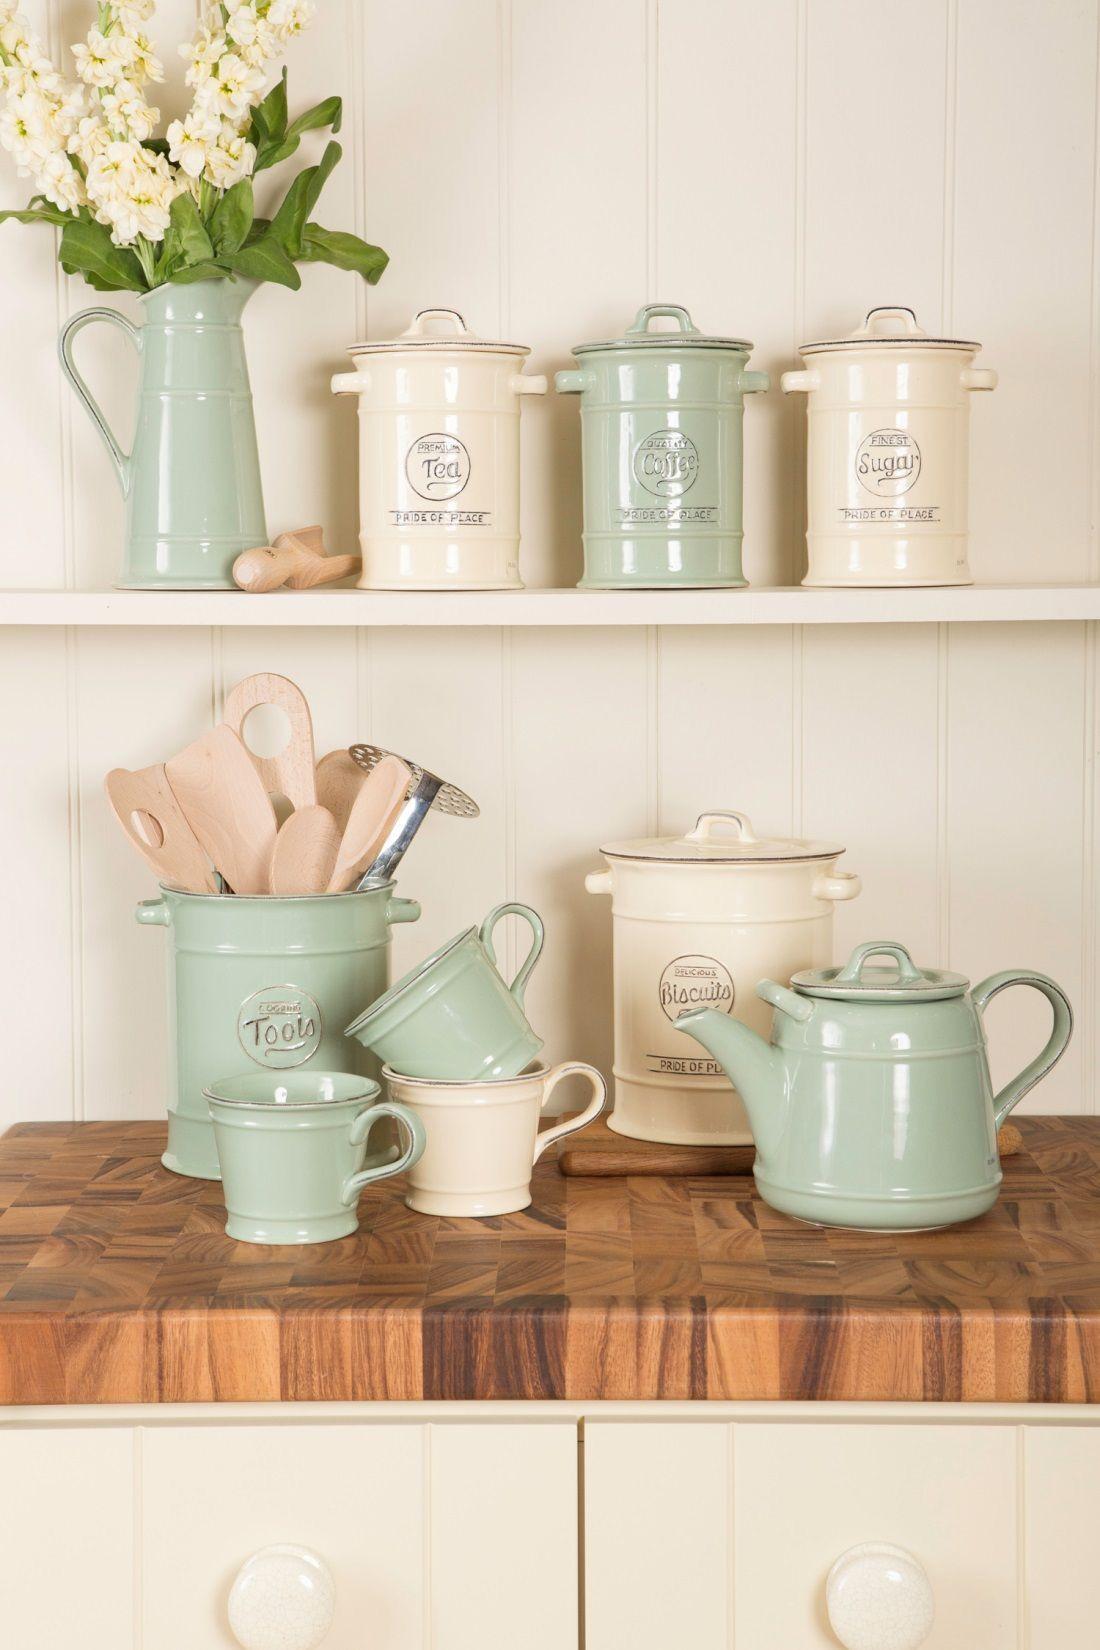 Farmhouse kitchen decor | shabby chic | Pinterest | Farmhouse ...